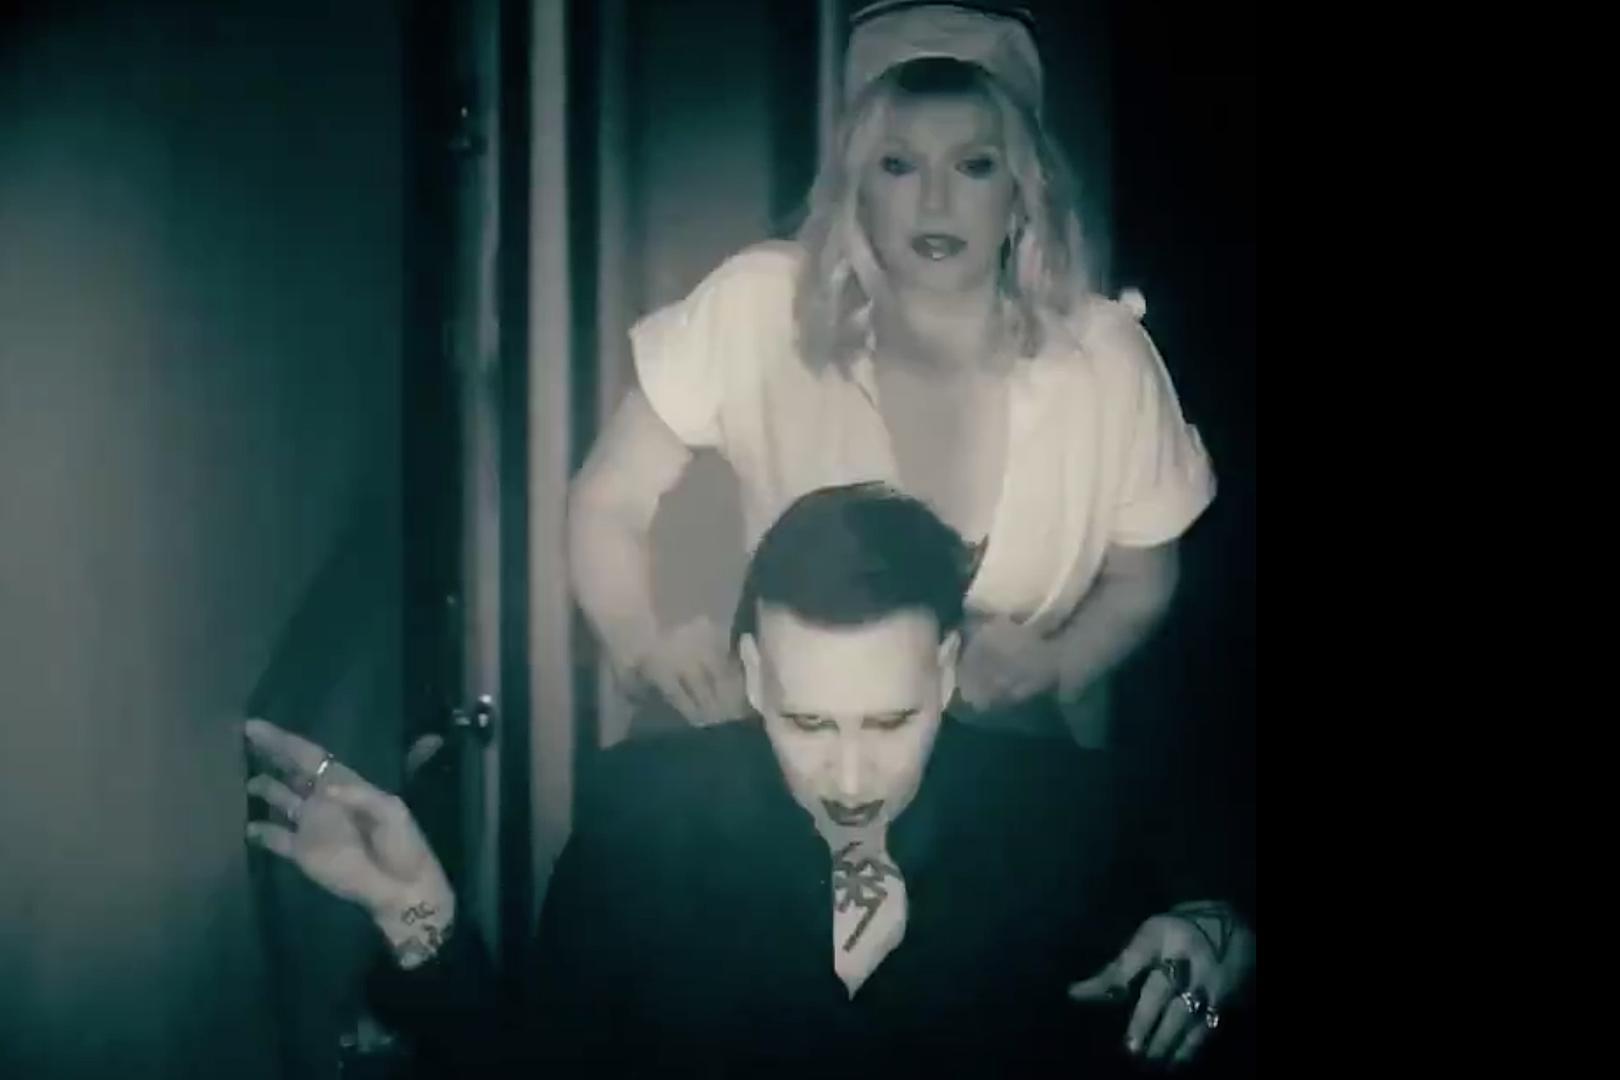 Marilyn Manson Casts Courtney Love as Nurse For 'Tattooed in Reverse' Video